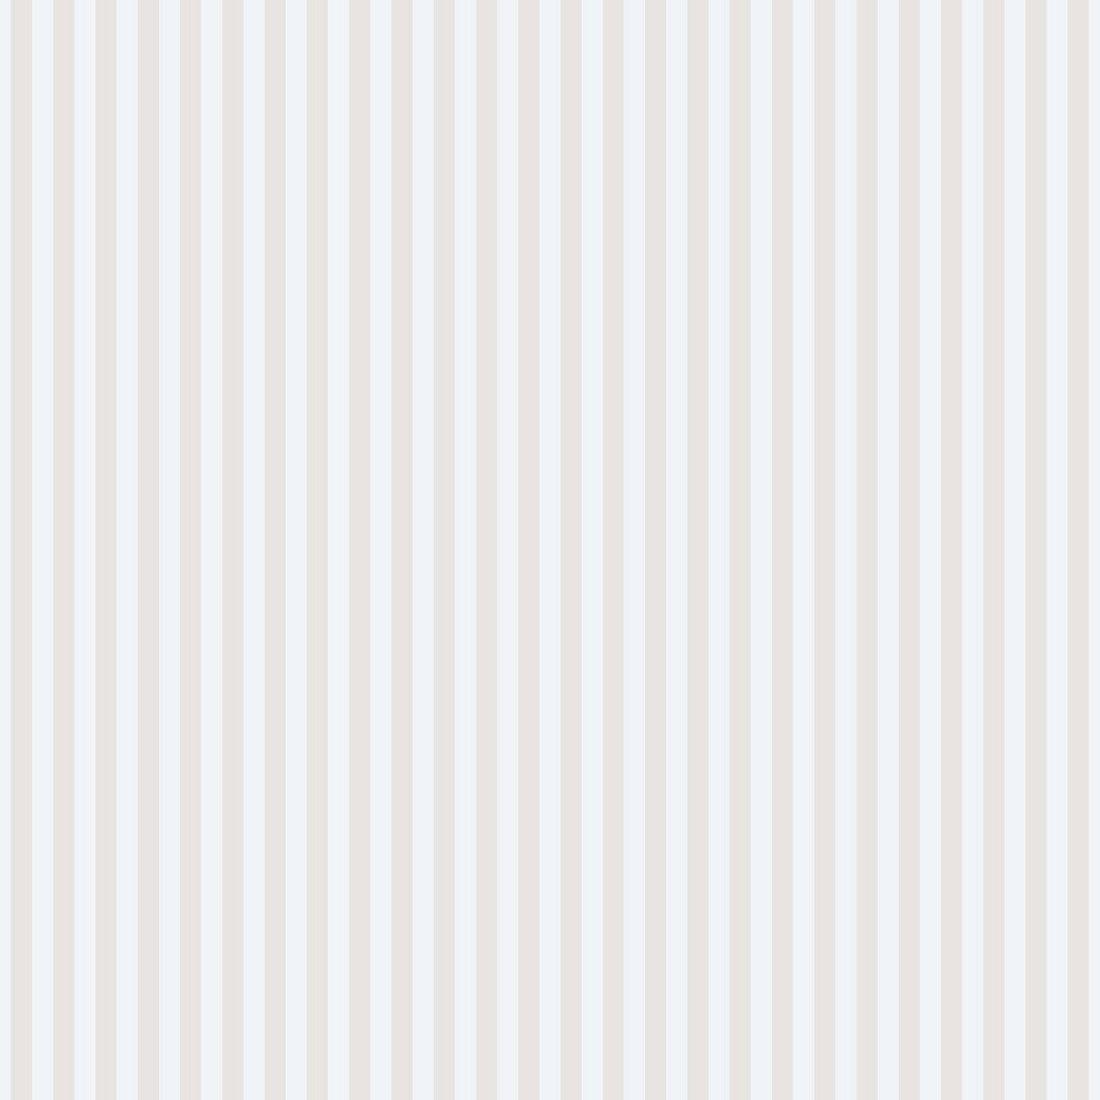 Papel Pintado Rayas Finas Color Lino Ref Mlw29881010 Papel  ~ Papel Pintado Rayas Gris Y Blanco